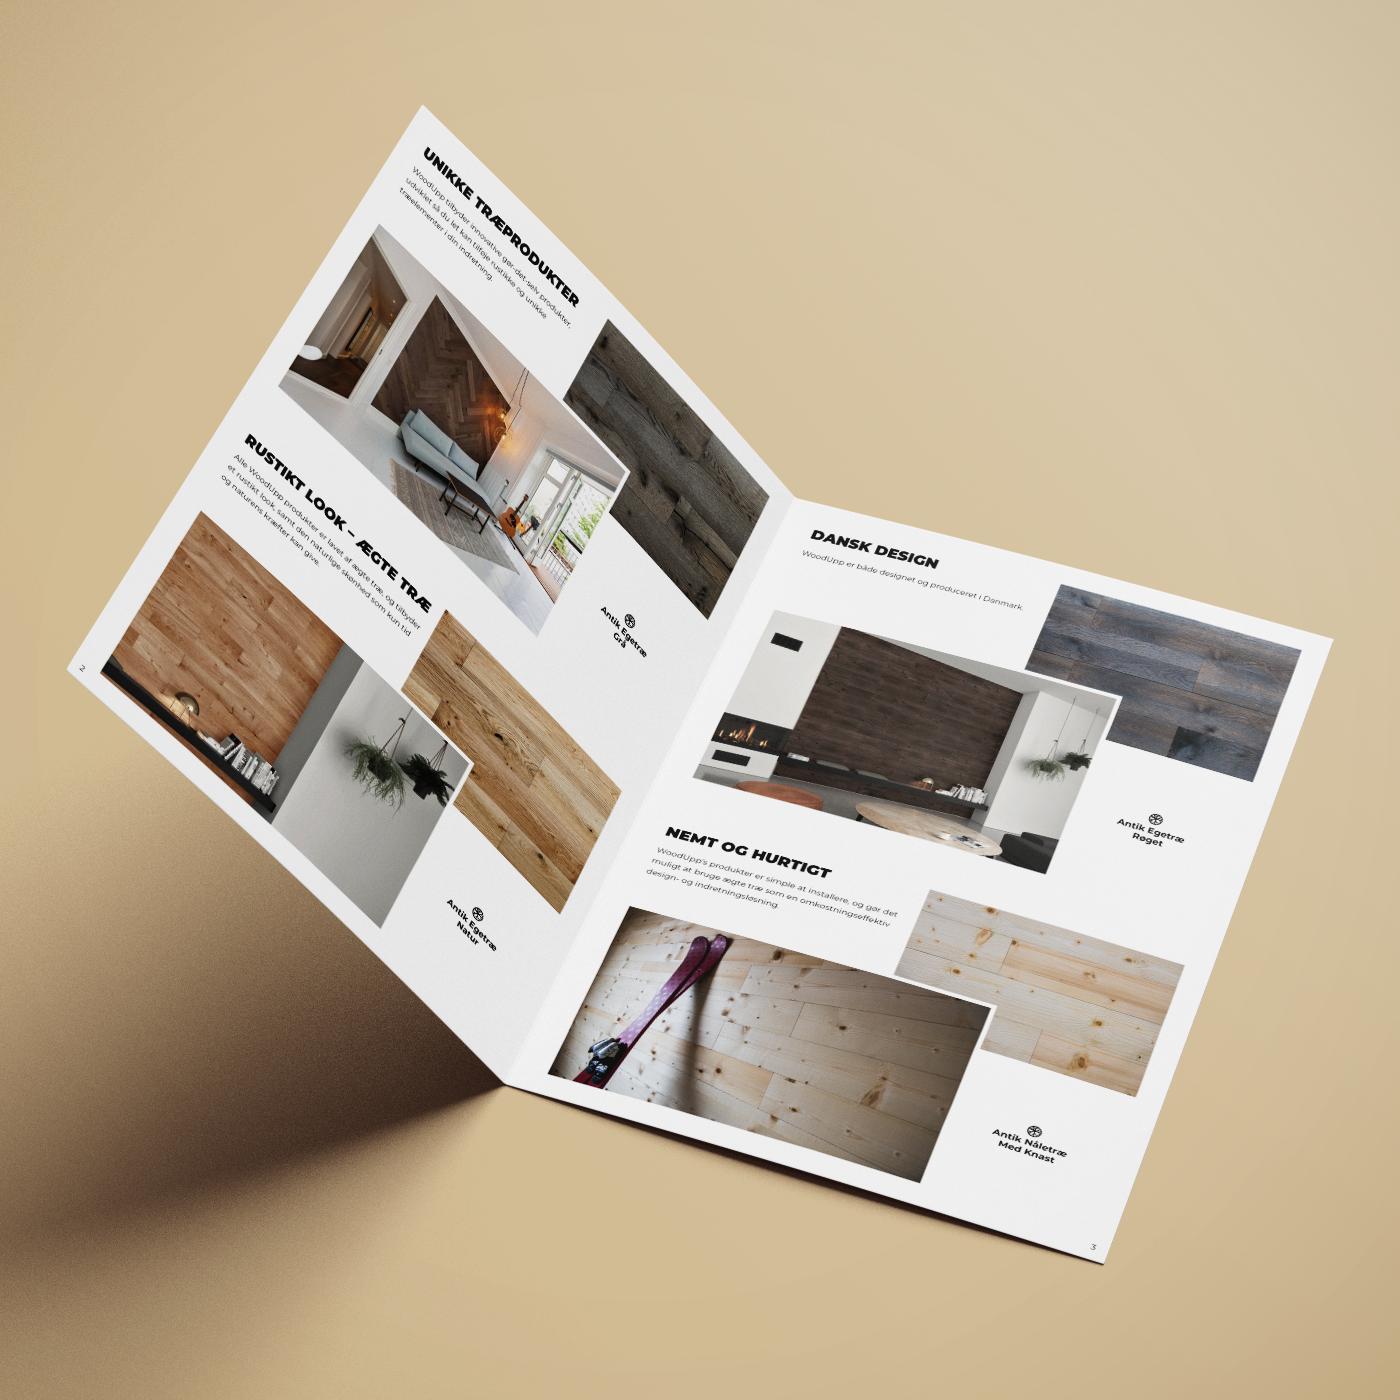 WoodUpp produktbrochure